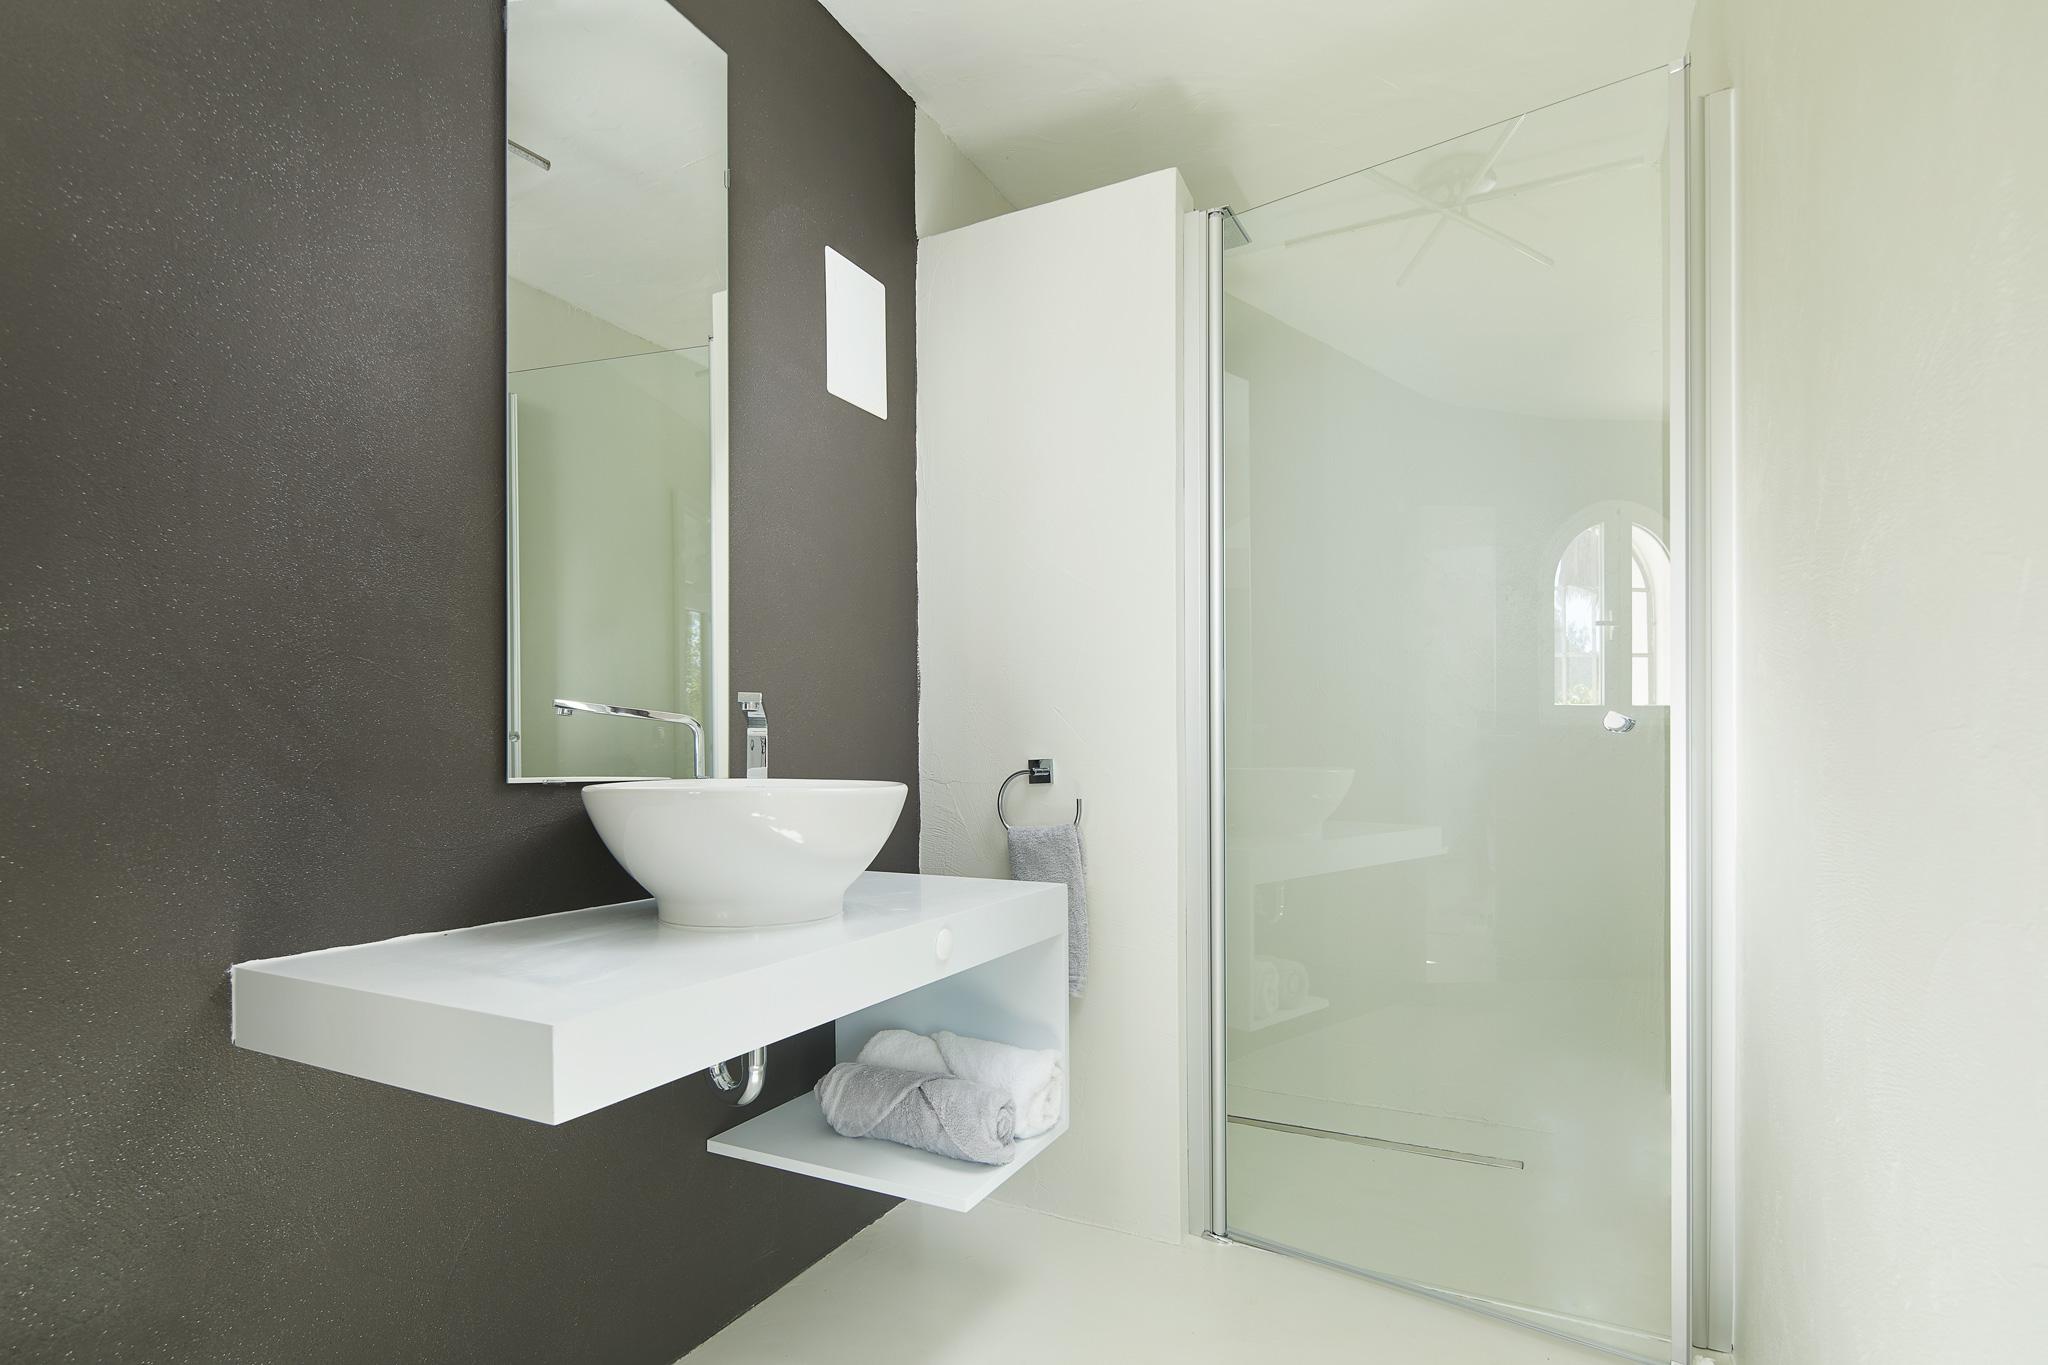 Bathroom_4.1.jpg